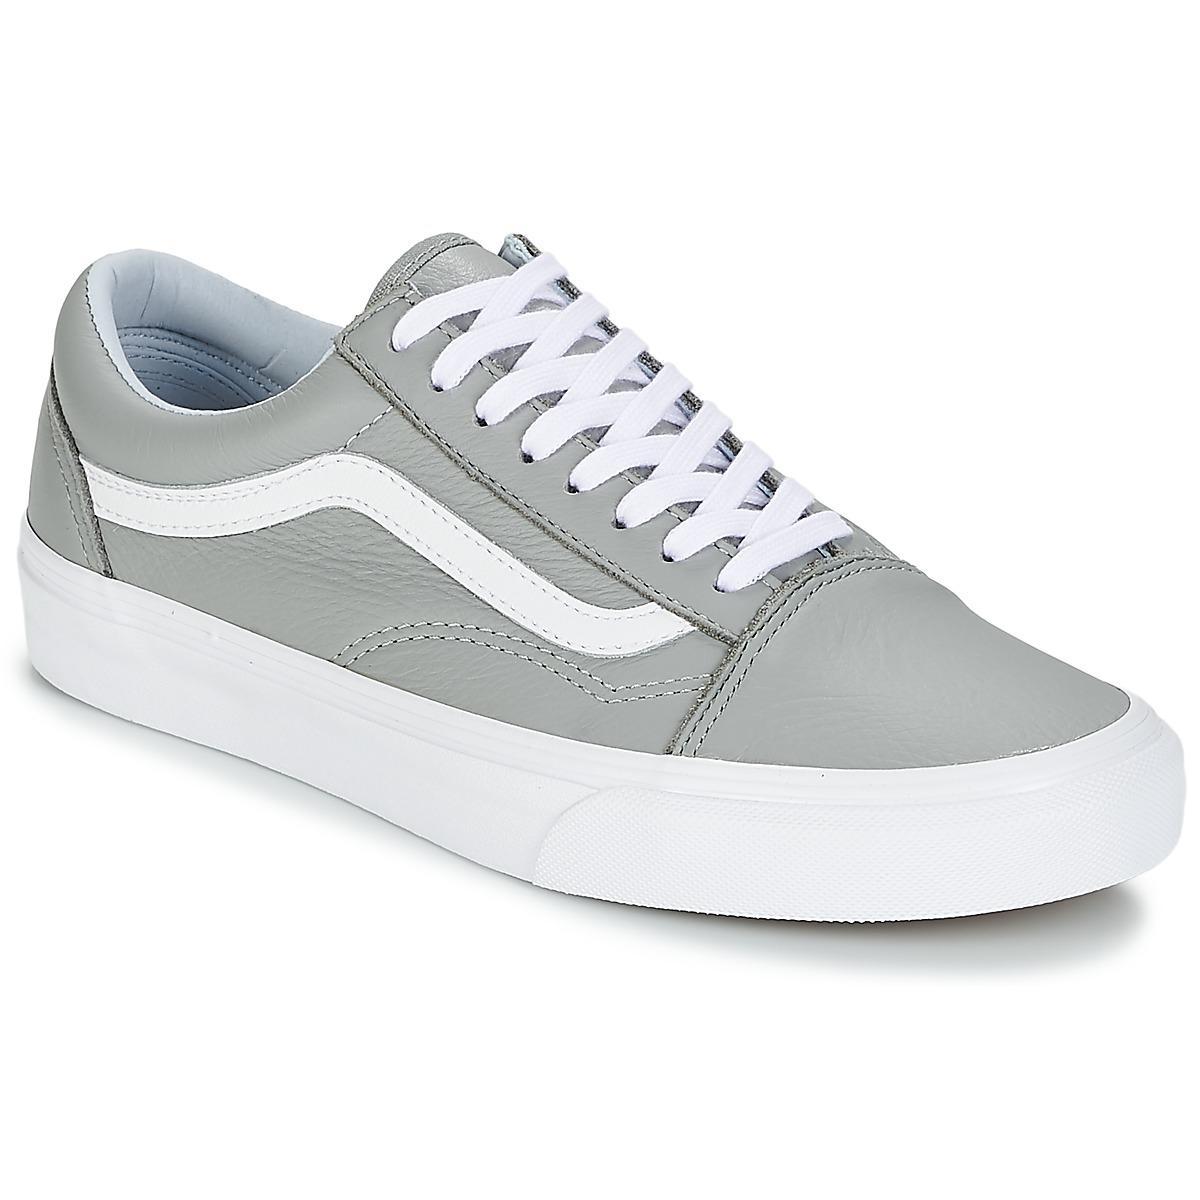 c3894c6724a8 Vans Old Skool Women s Shoes (trainers) In Grey in Gray - Lyst